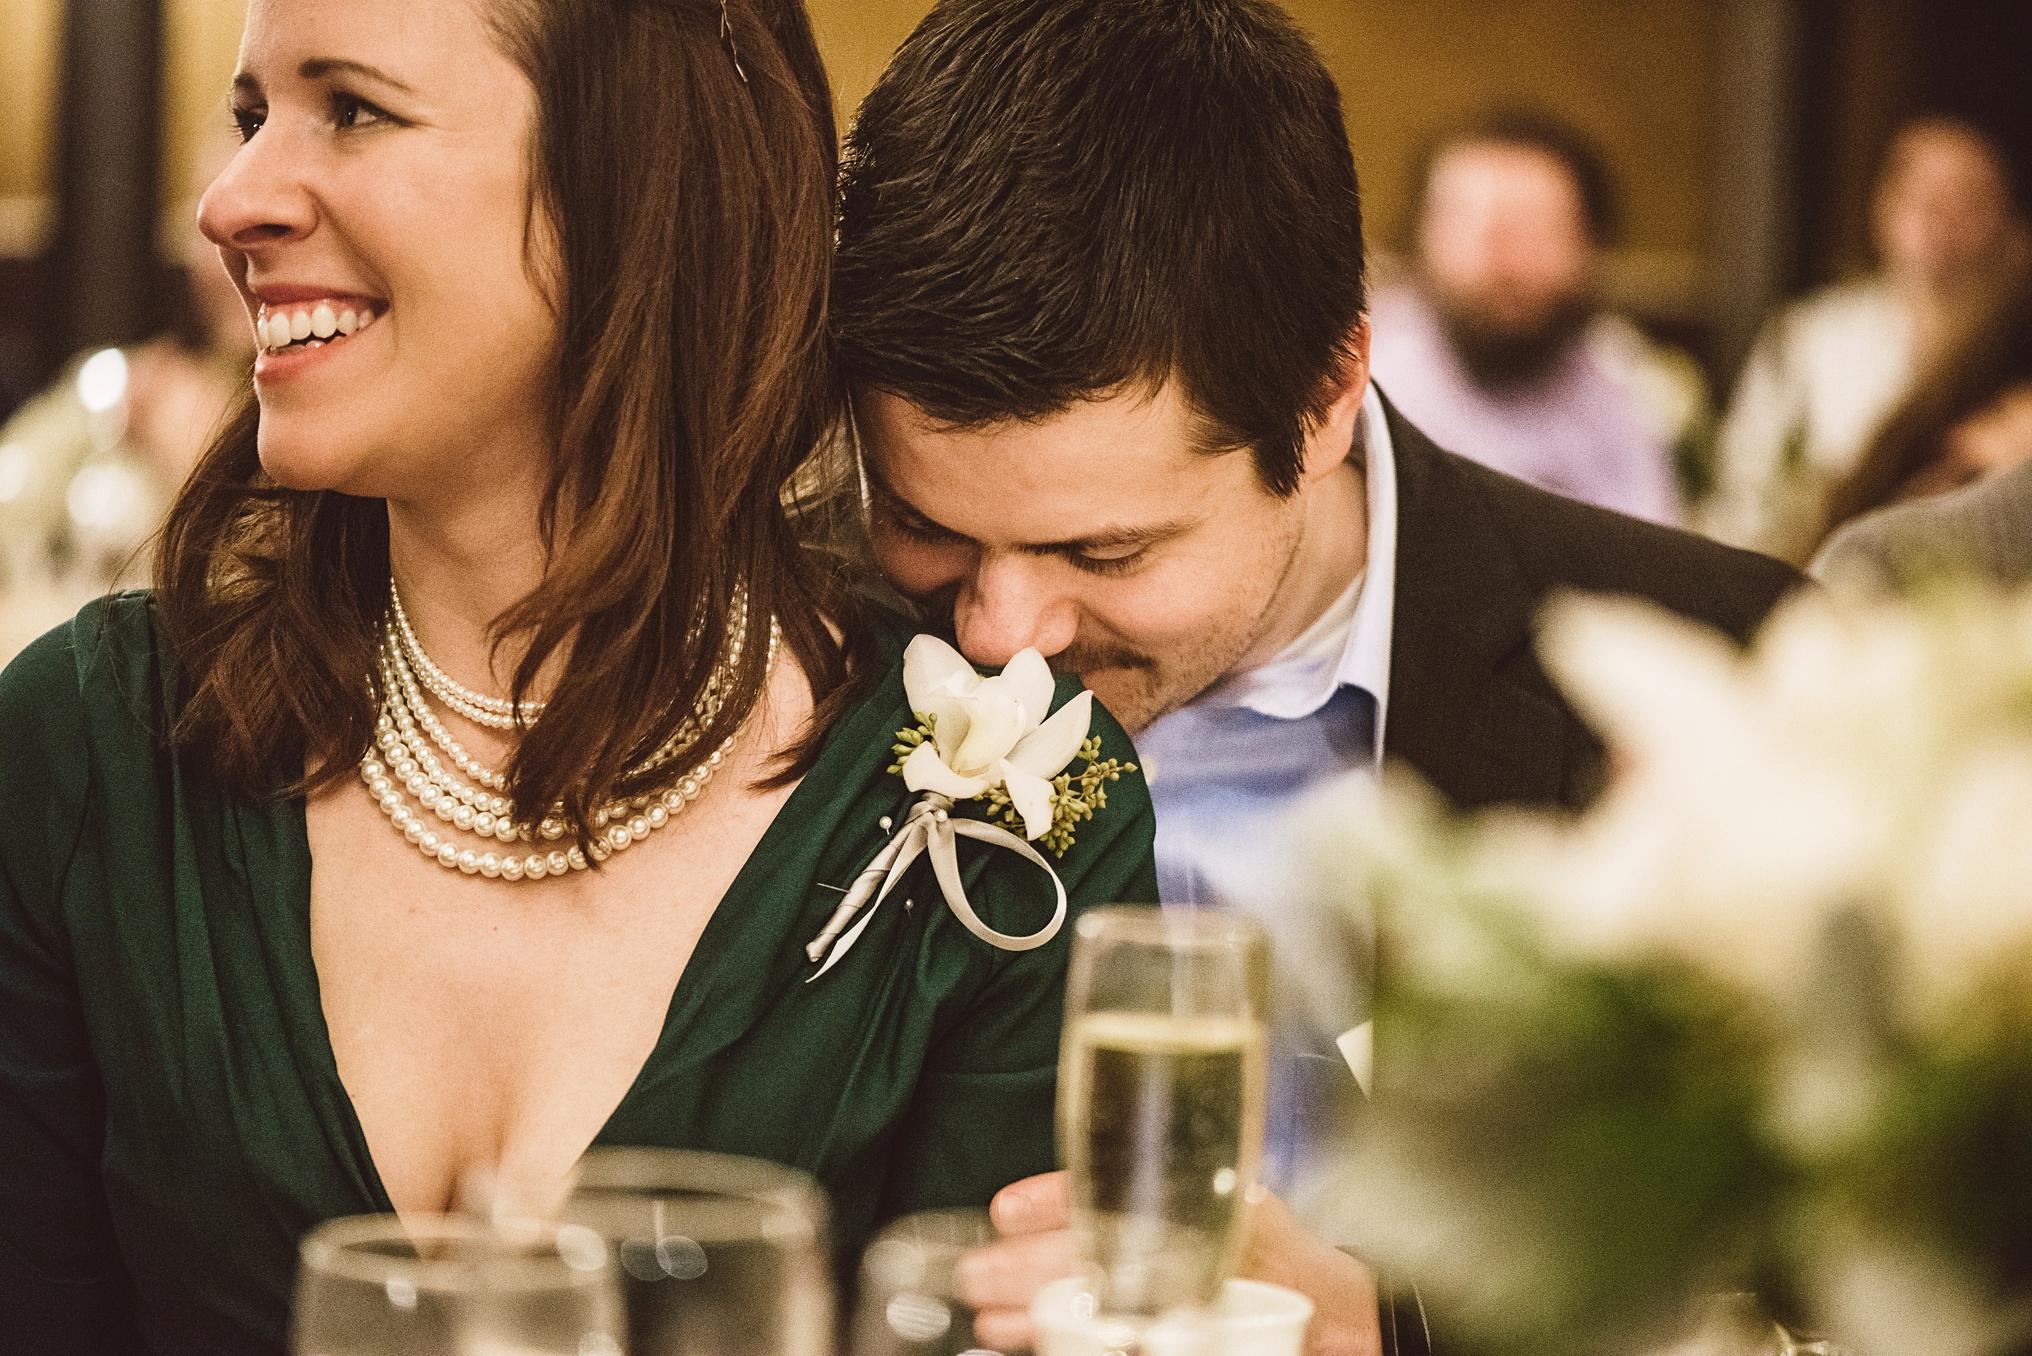 best_wedding_photography_2017_by_lucas_botz_photography_018.jpg